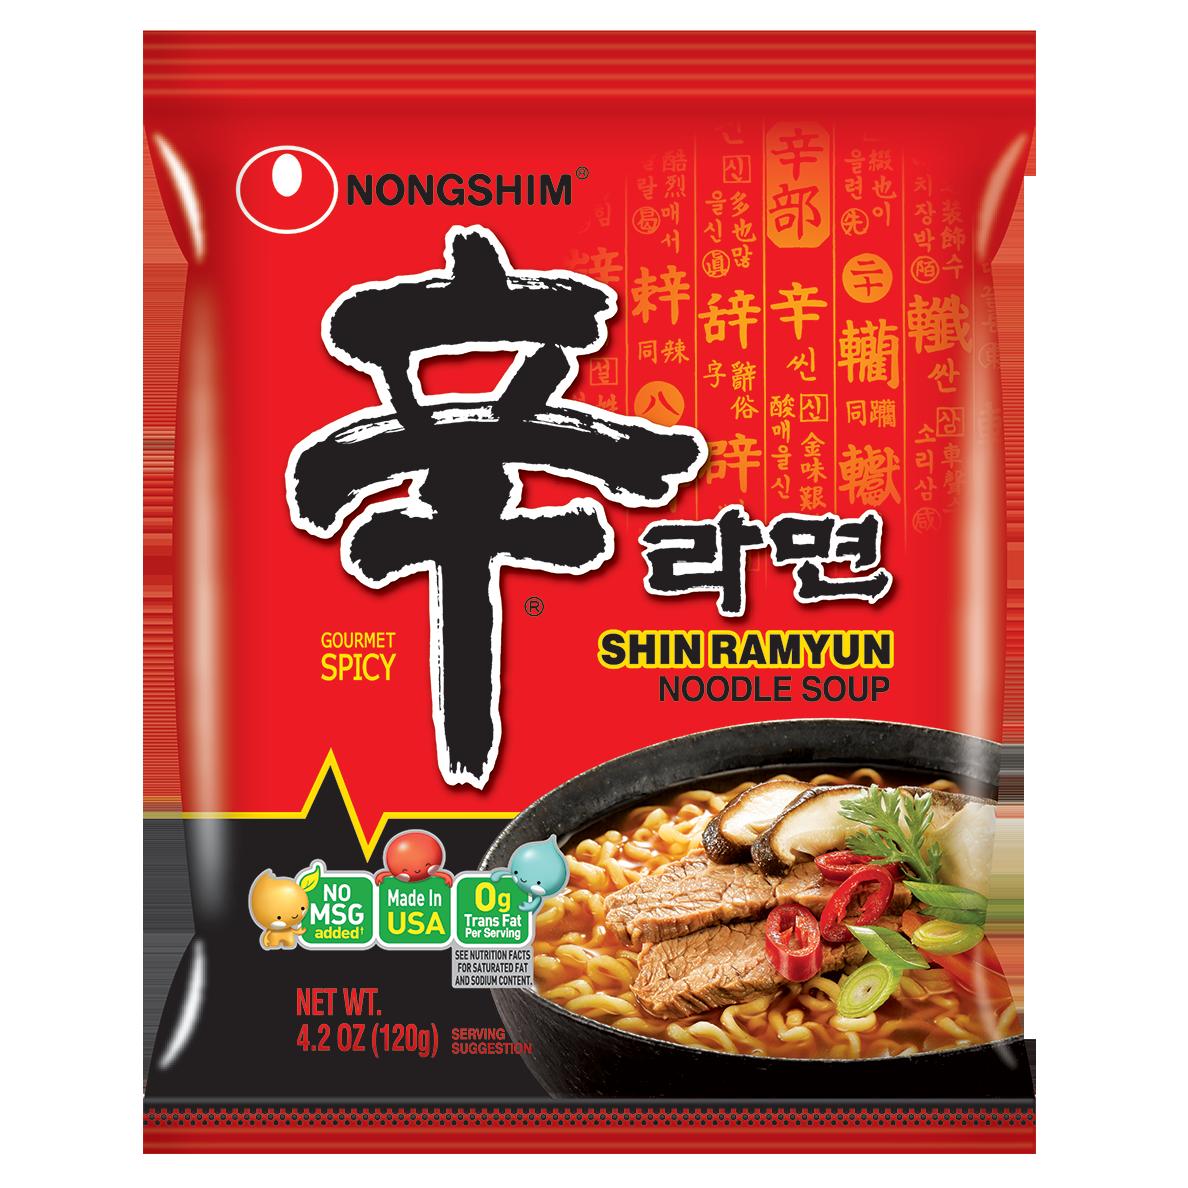 Amazon.com : Nongshim Shin Ramyun Noodle Soup, Gourmet